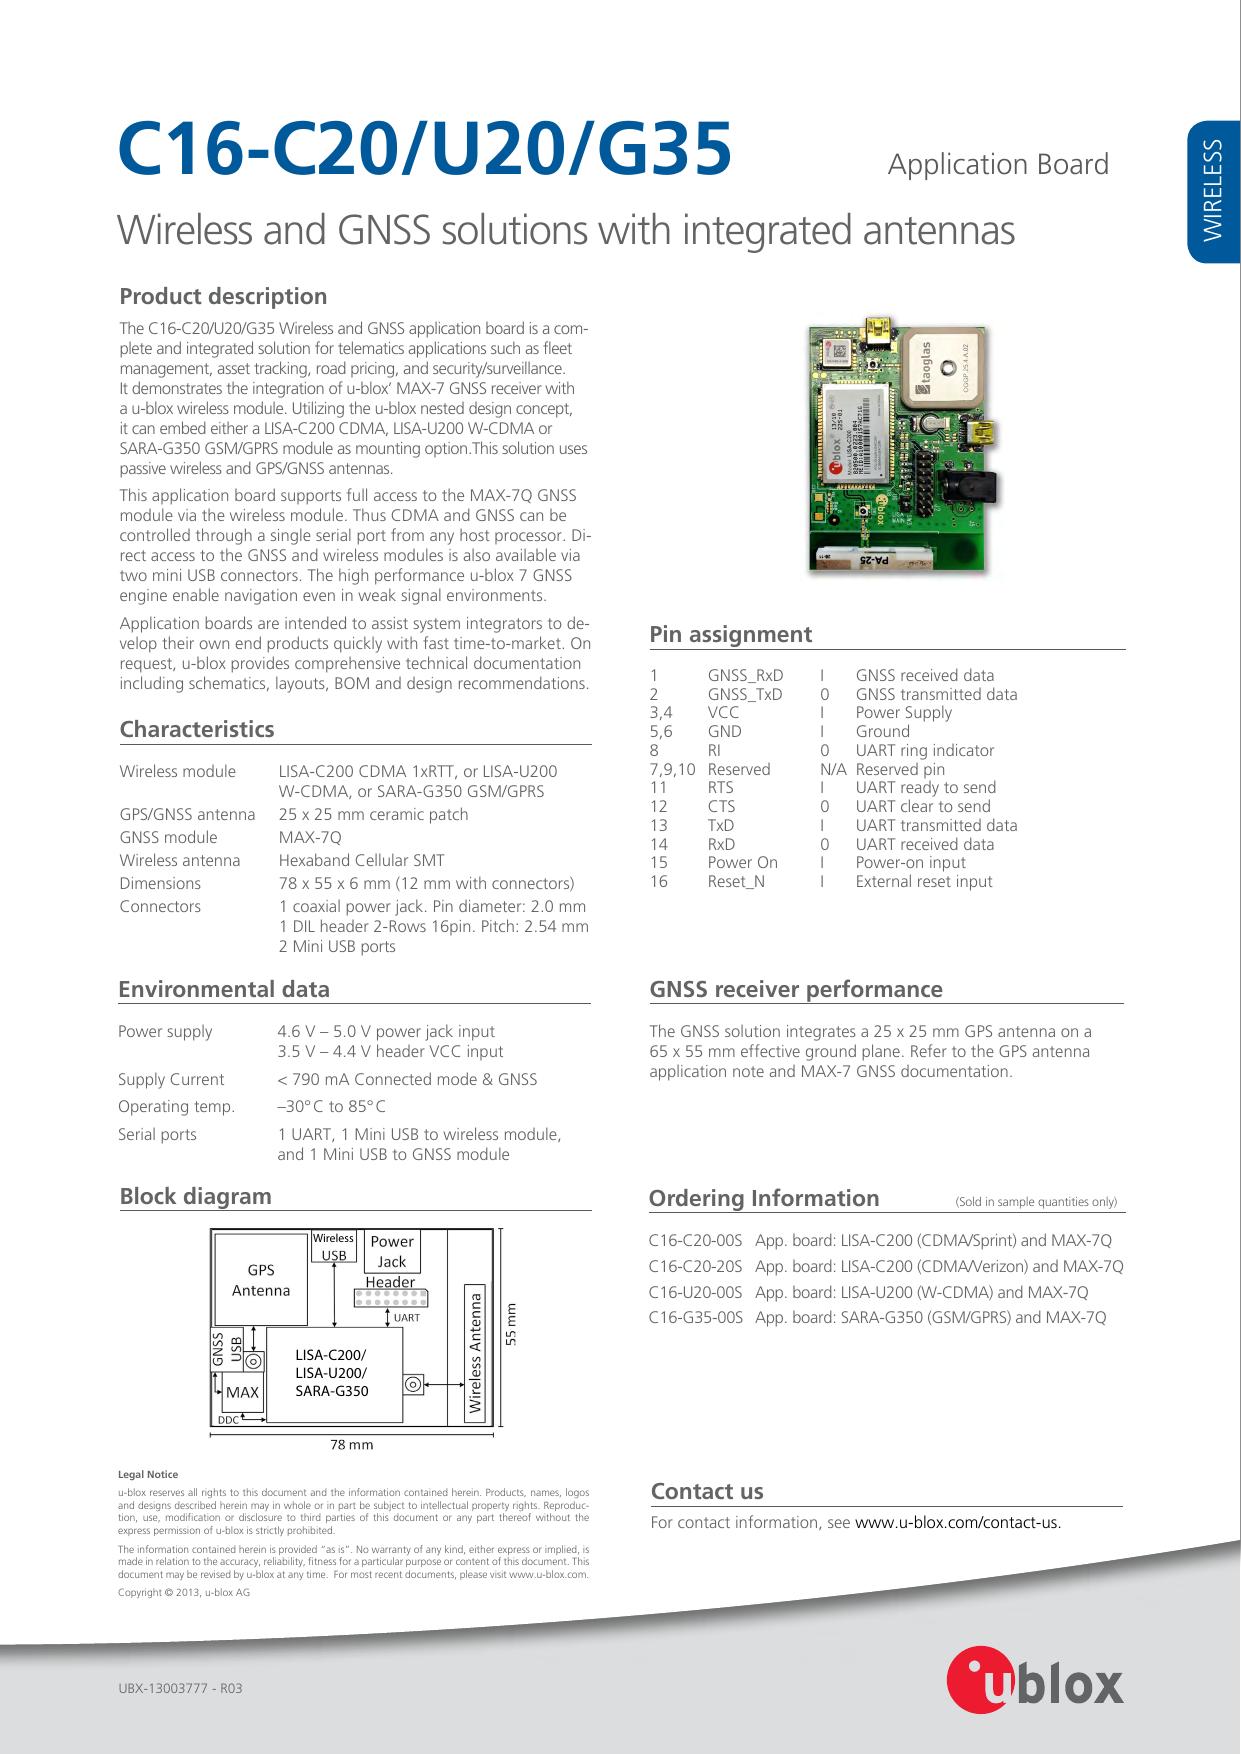 C16-C20/U20/G35 Application Board - u-blox | manualzz com